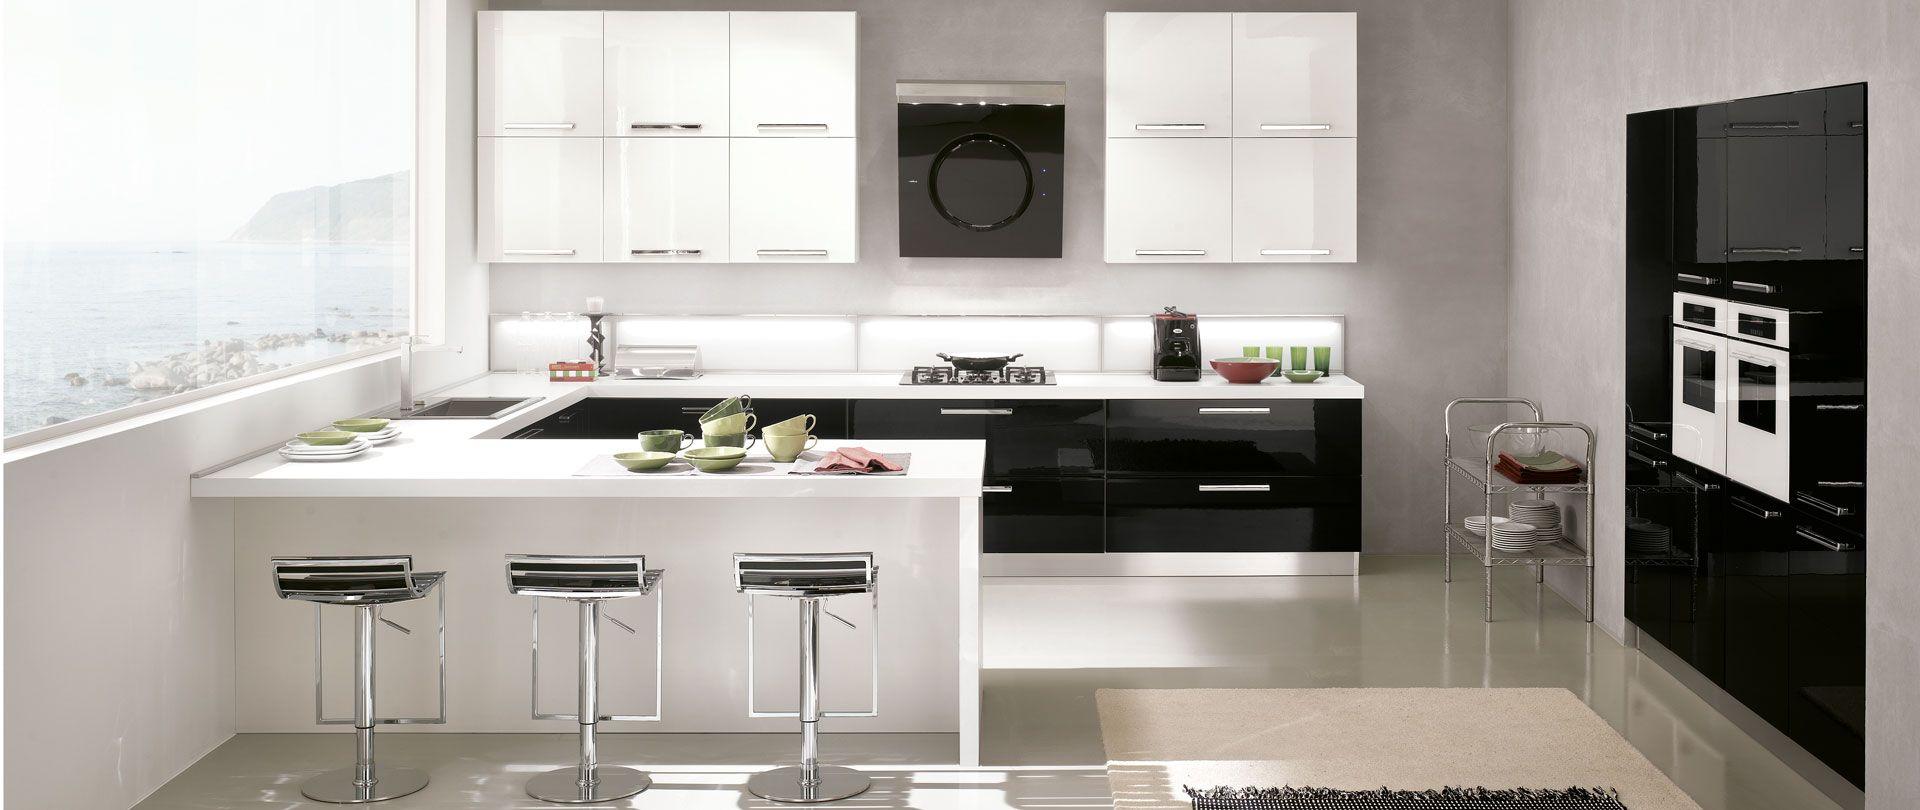 Risultati immagini per cucina a u con isola | cucine | Cucine e Immagini